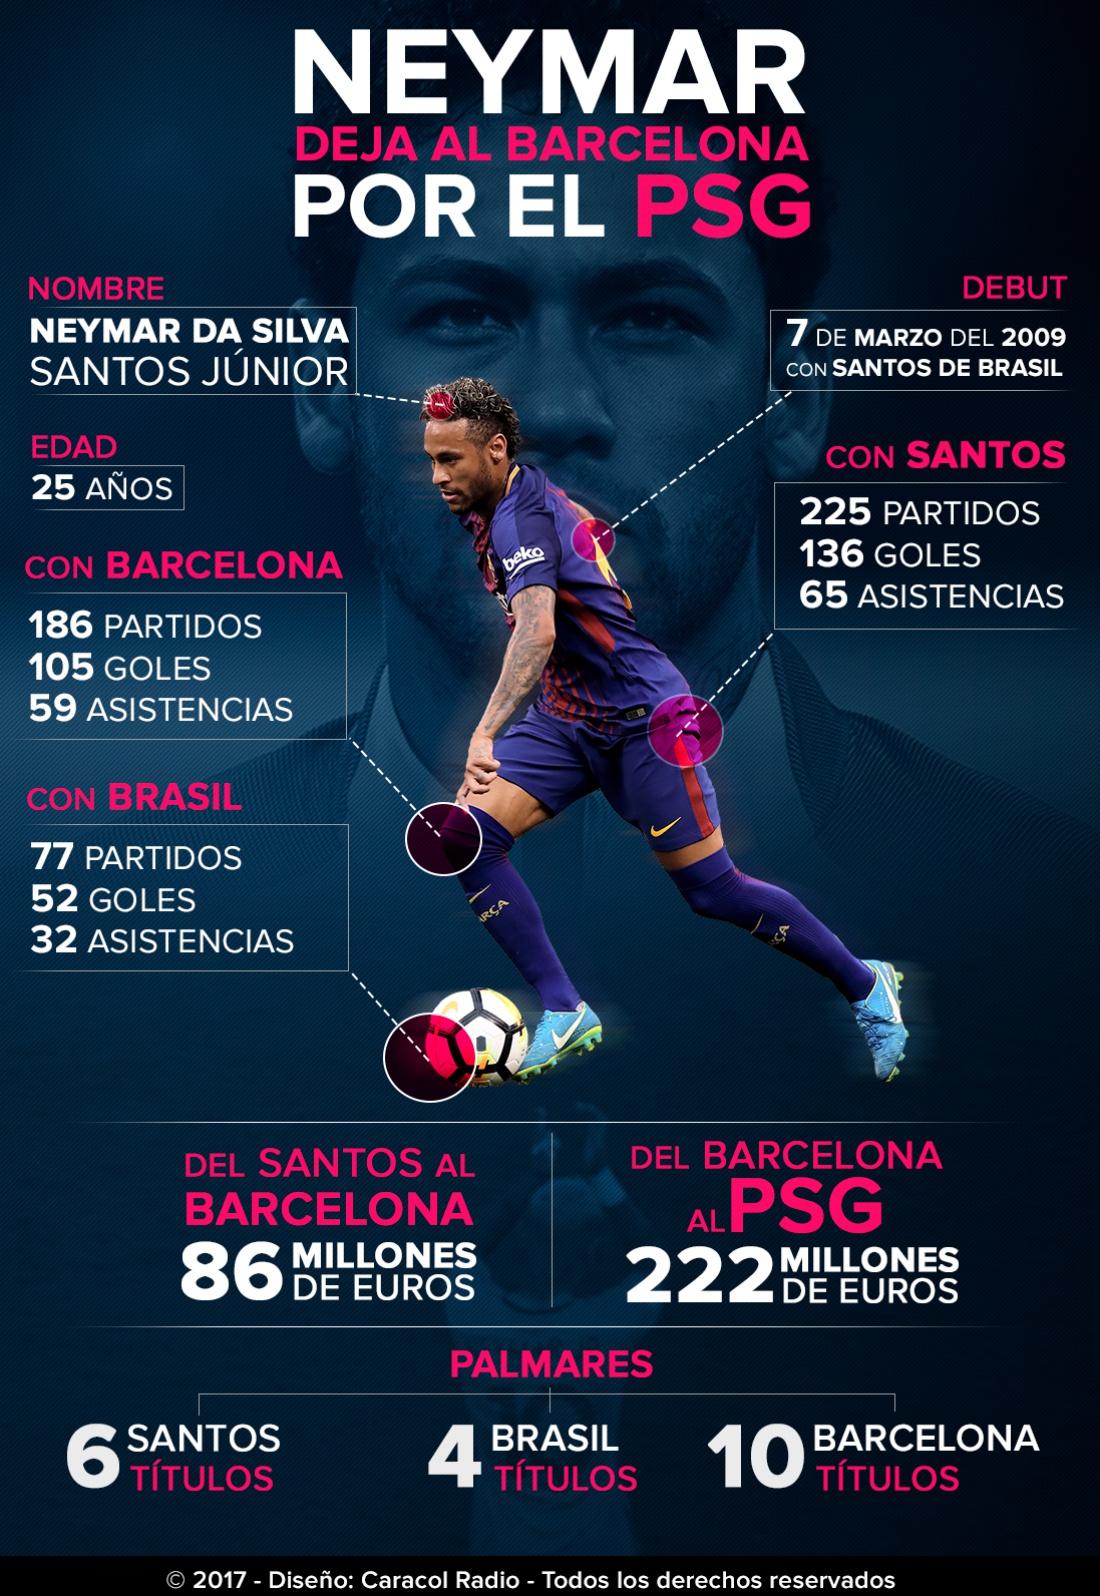 Números carrera deportiva Neymar: En números: la carrera deportiva de Neymar, el nuevo crack del PSG